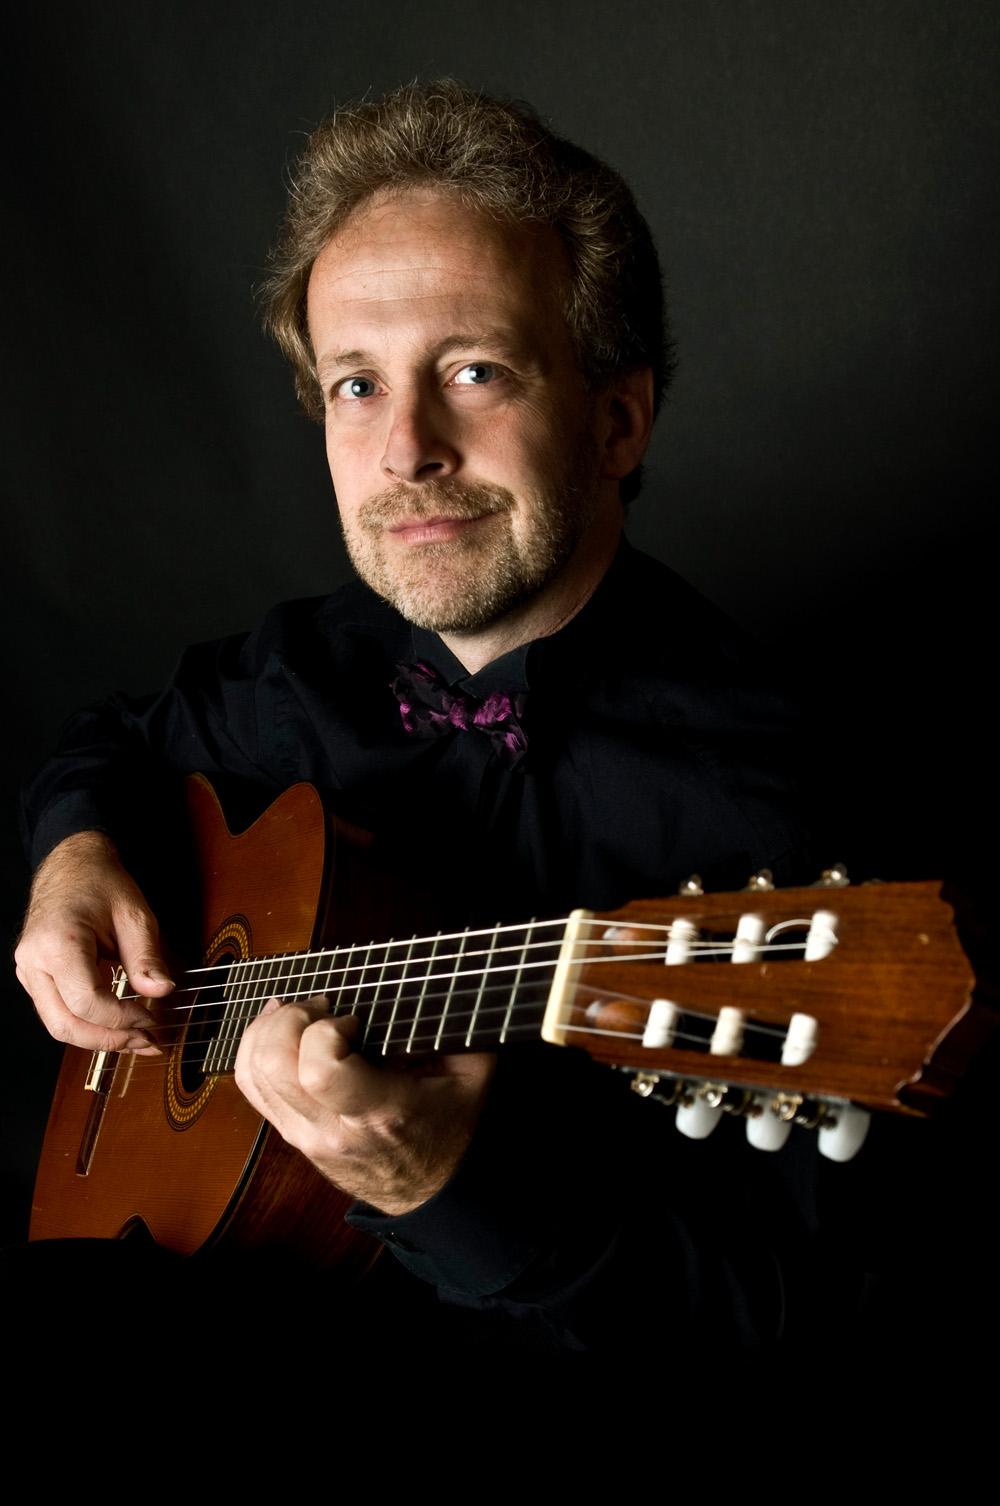 Matthias Kläger